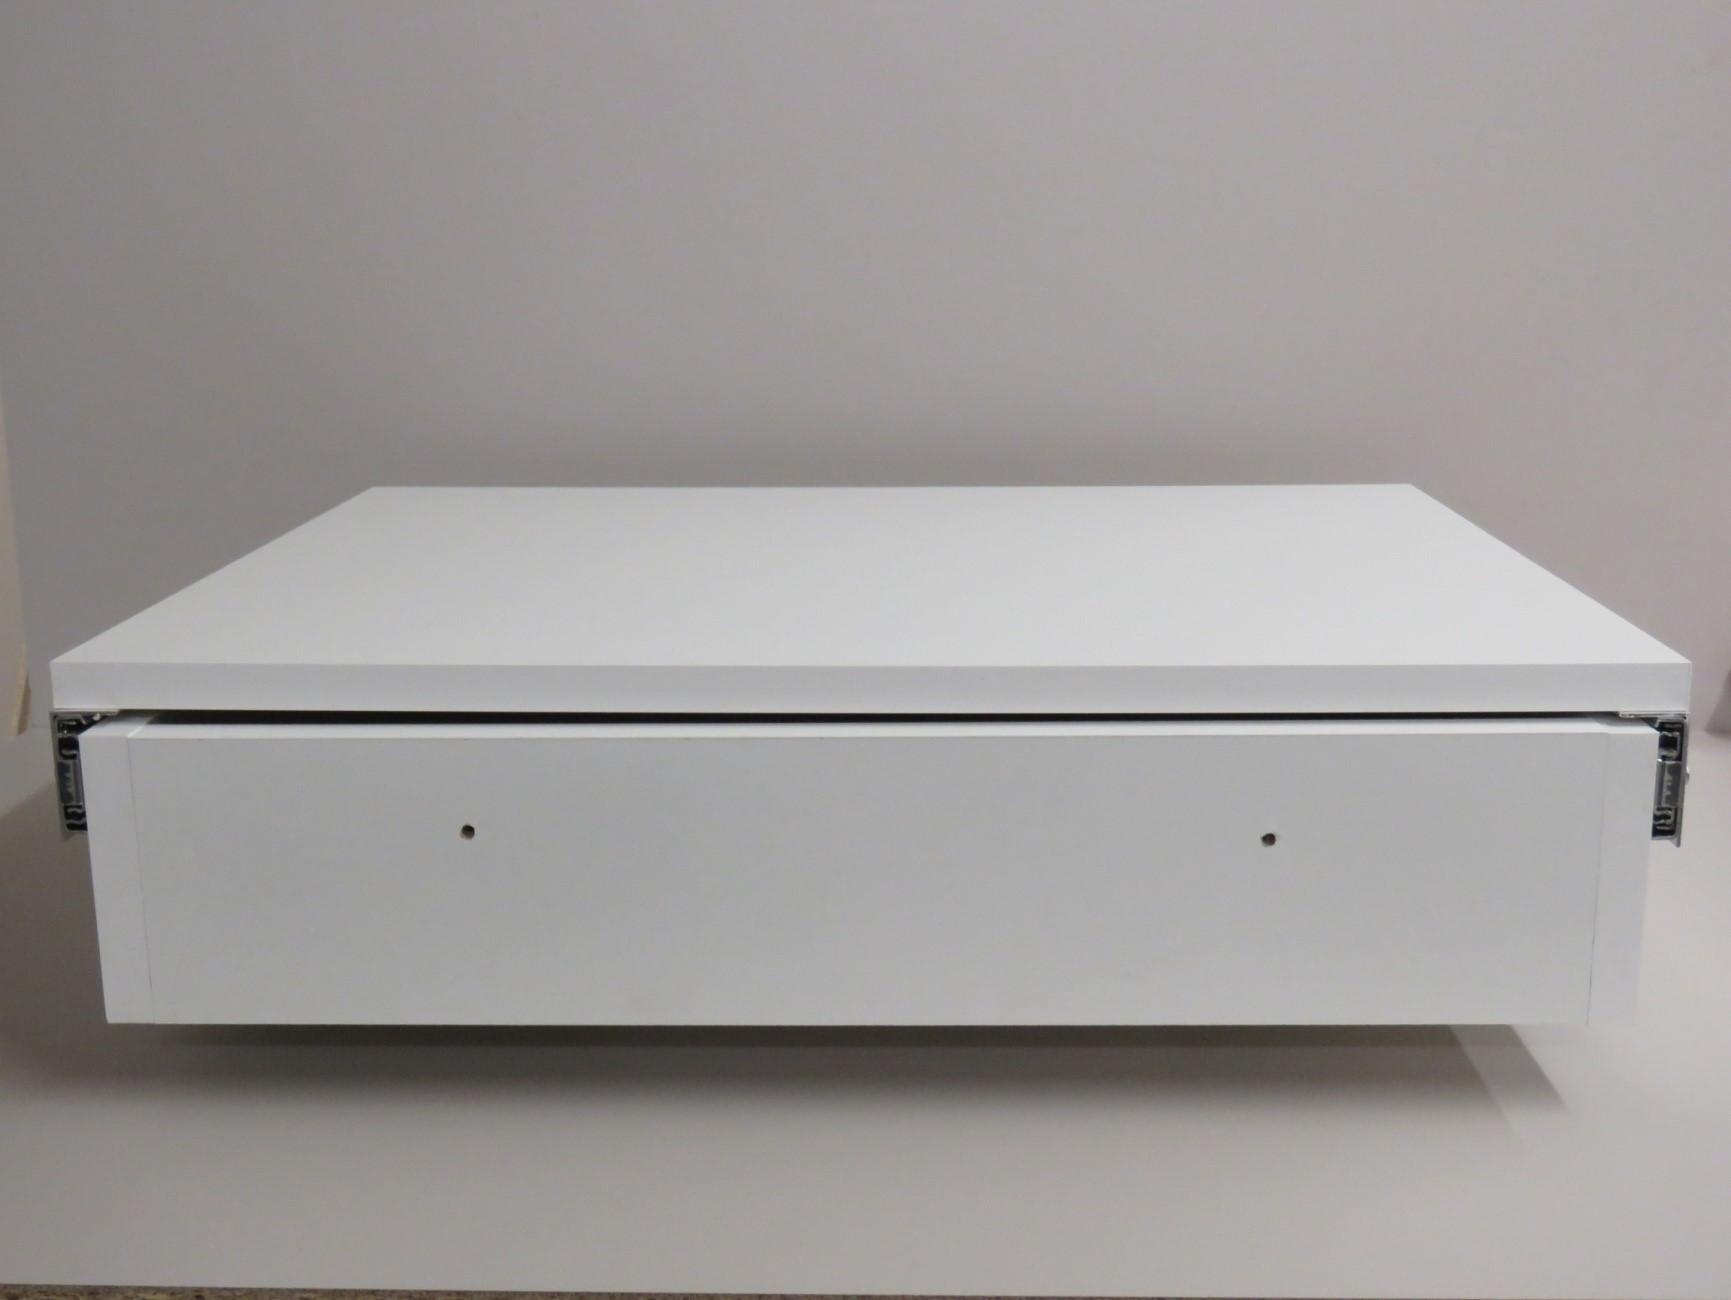 Plinth Box System - 400mm D x 137mm H x for a 700mm Wide Unit